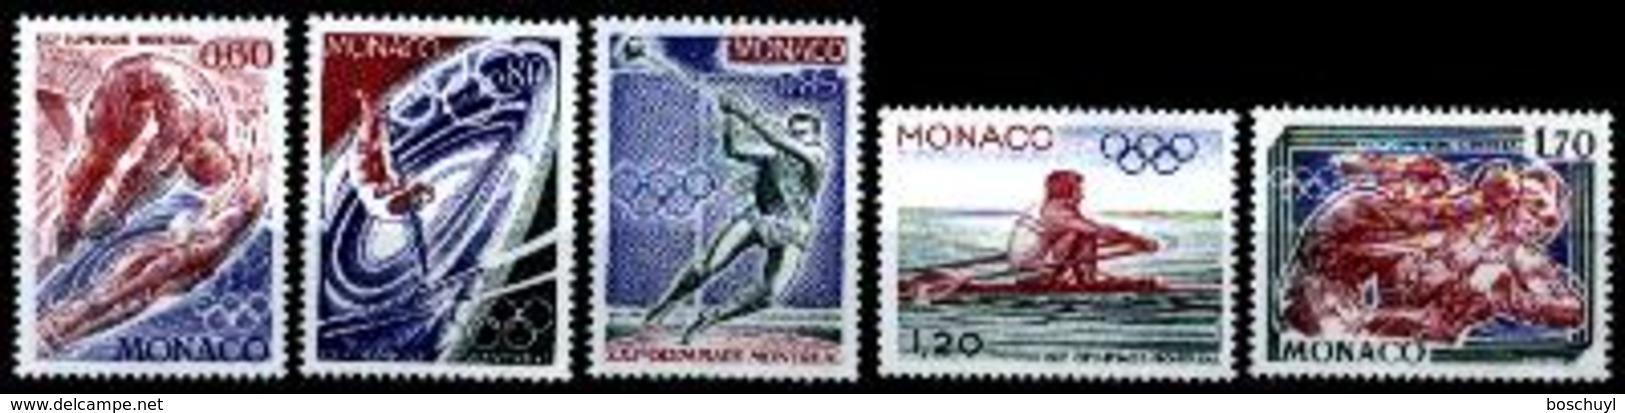 Monaco, 1976, Olympic Summer Games Montreal, Sports, MNH, Michel 1225-1229 - Monaco